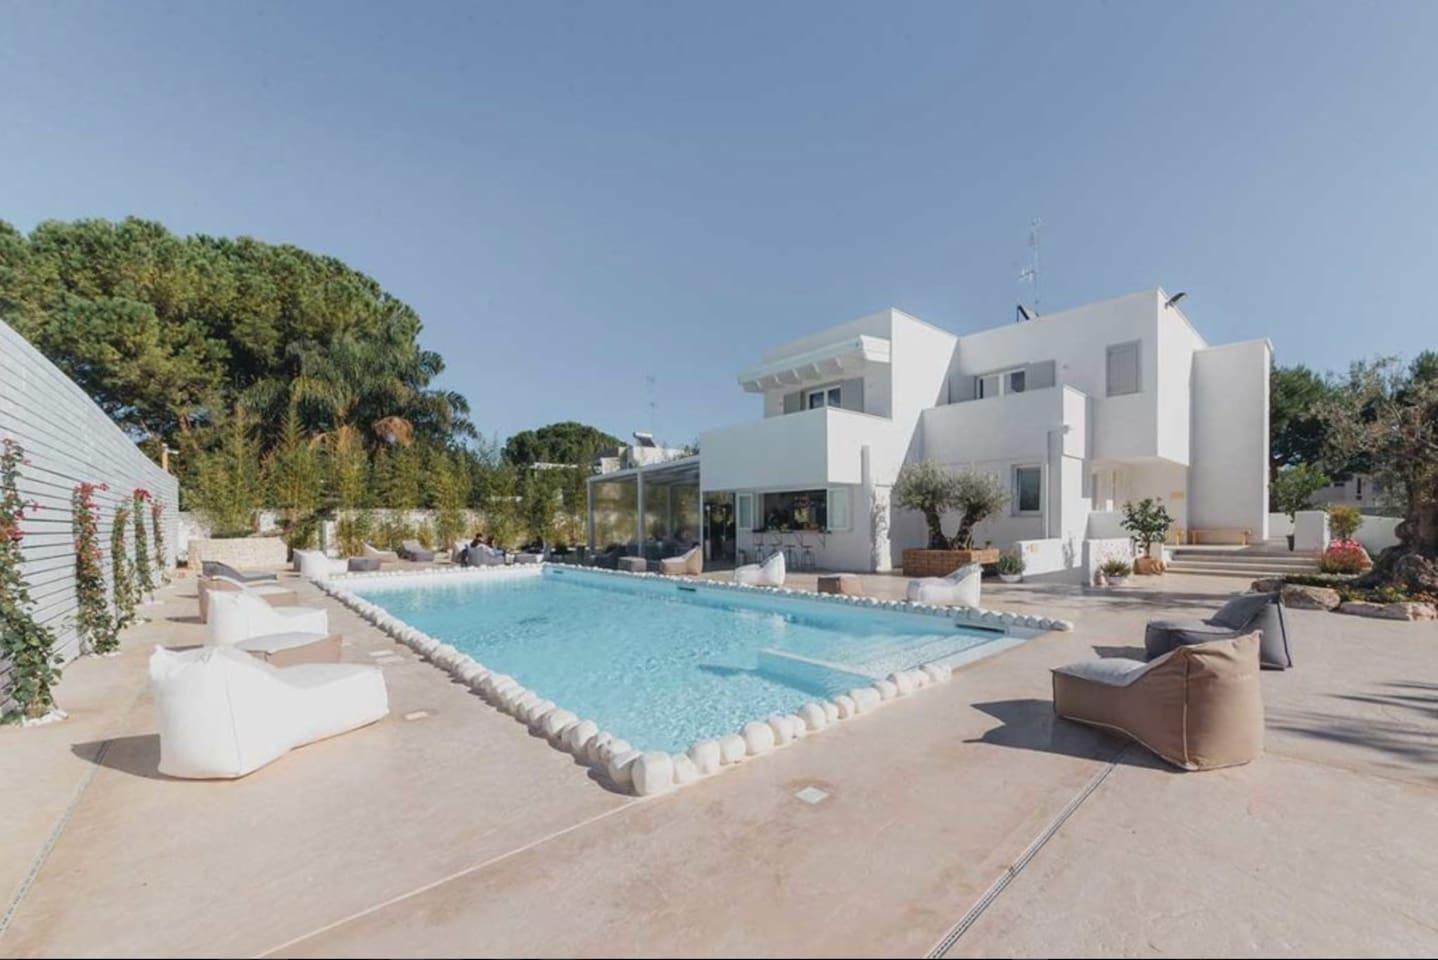 La villa con piscina